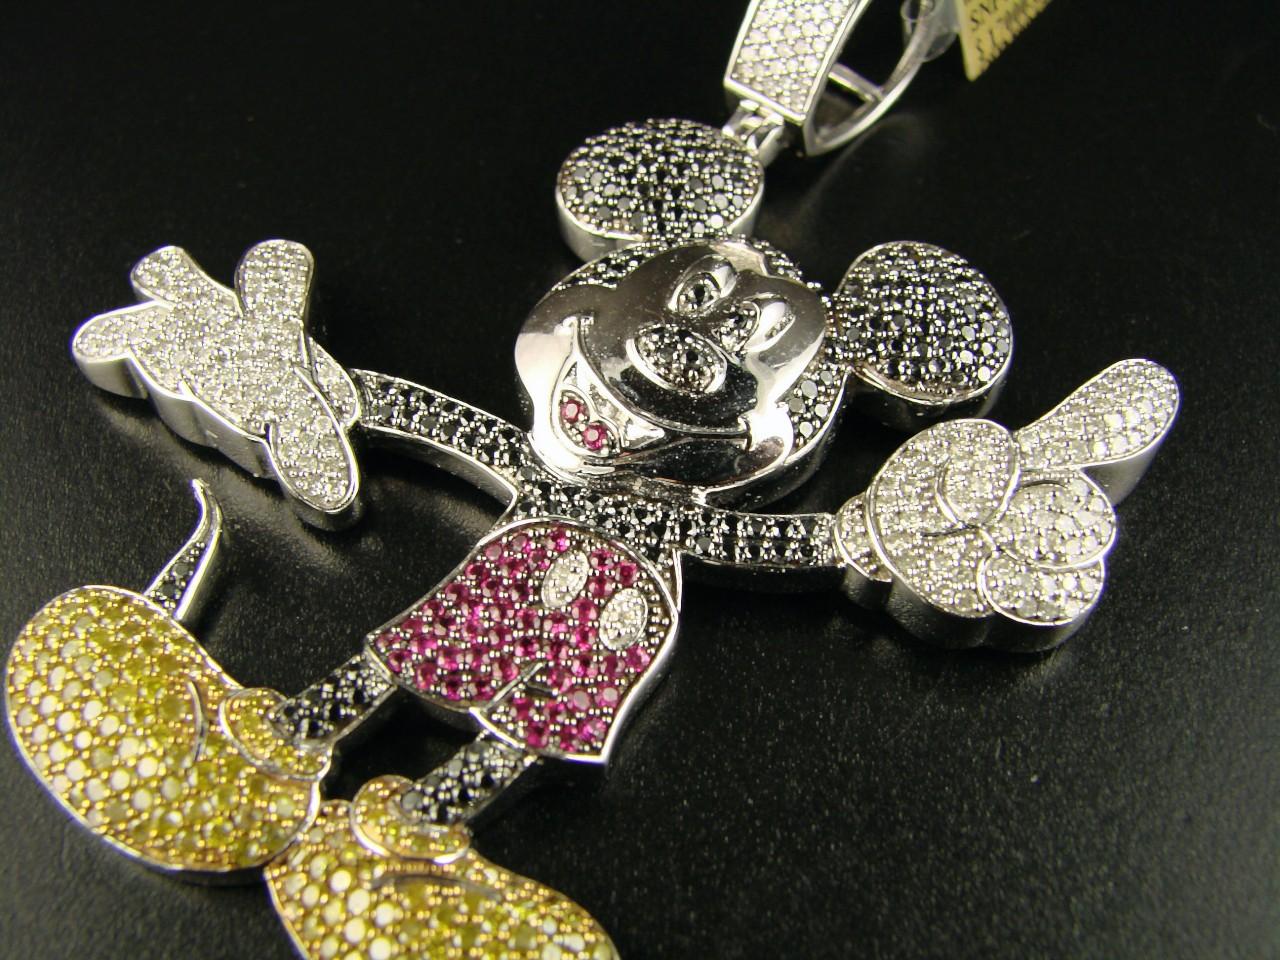 Newyorkjewels 10k cartoon mickey mouse diamond pendant charm 785 ct 10k cartoon mickey mouse diamond pendant charm 785 ct aloadofball Images